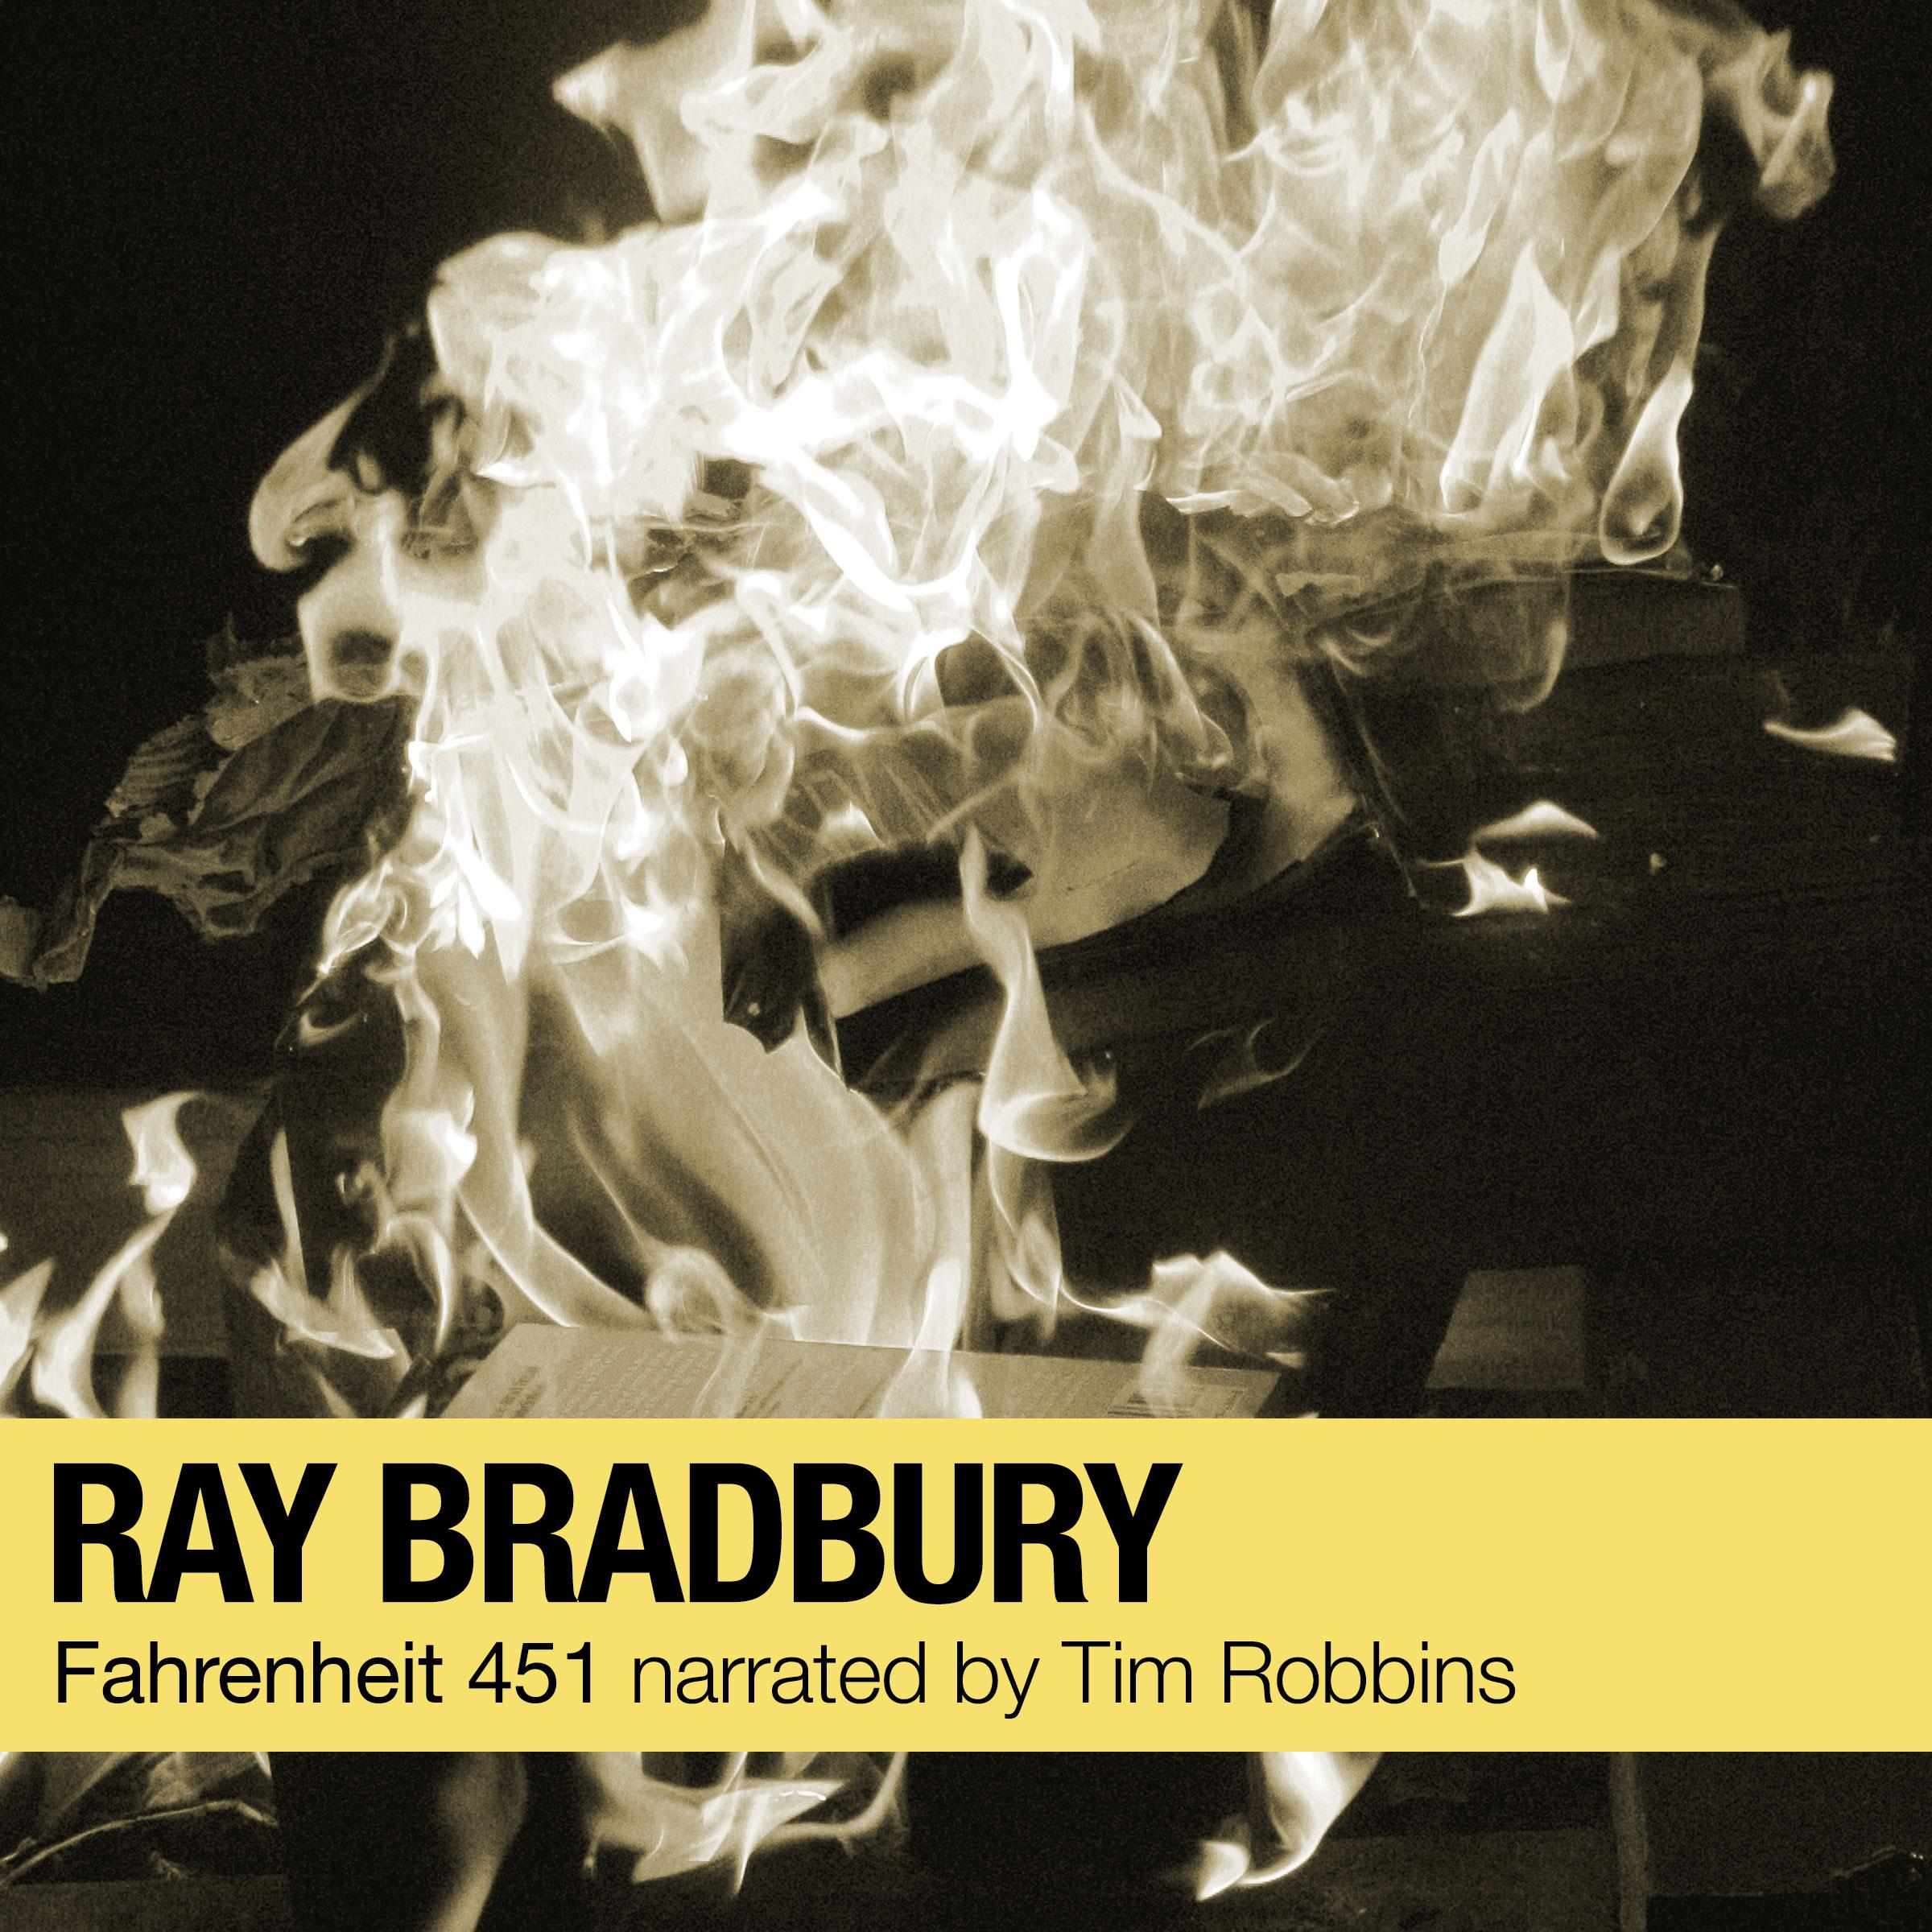 ADBLCRE-3712-Create-Covers-Ray-Bradbury-F-451-v3.jpg